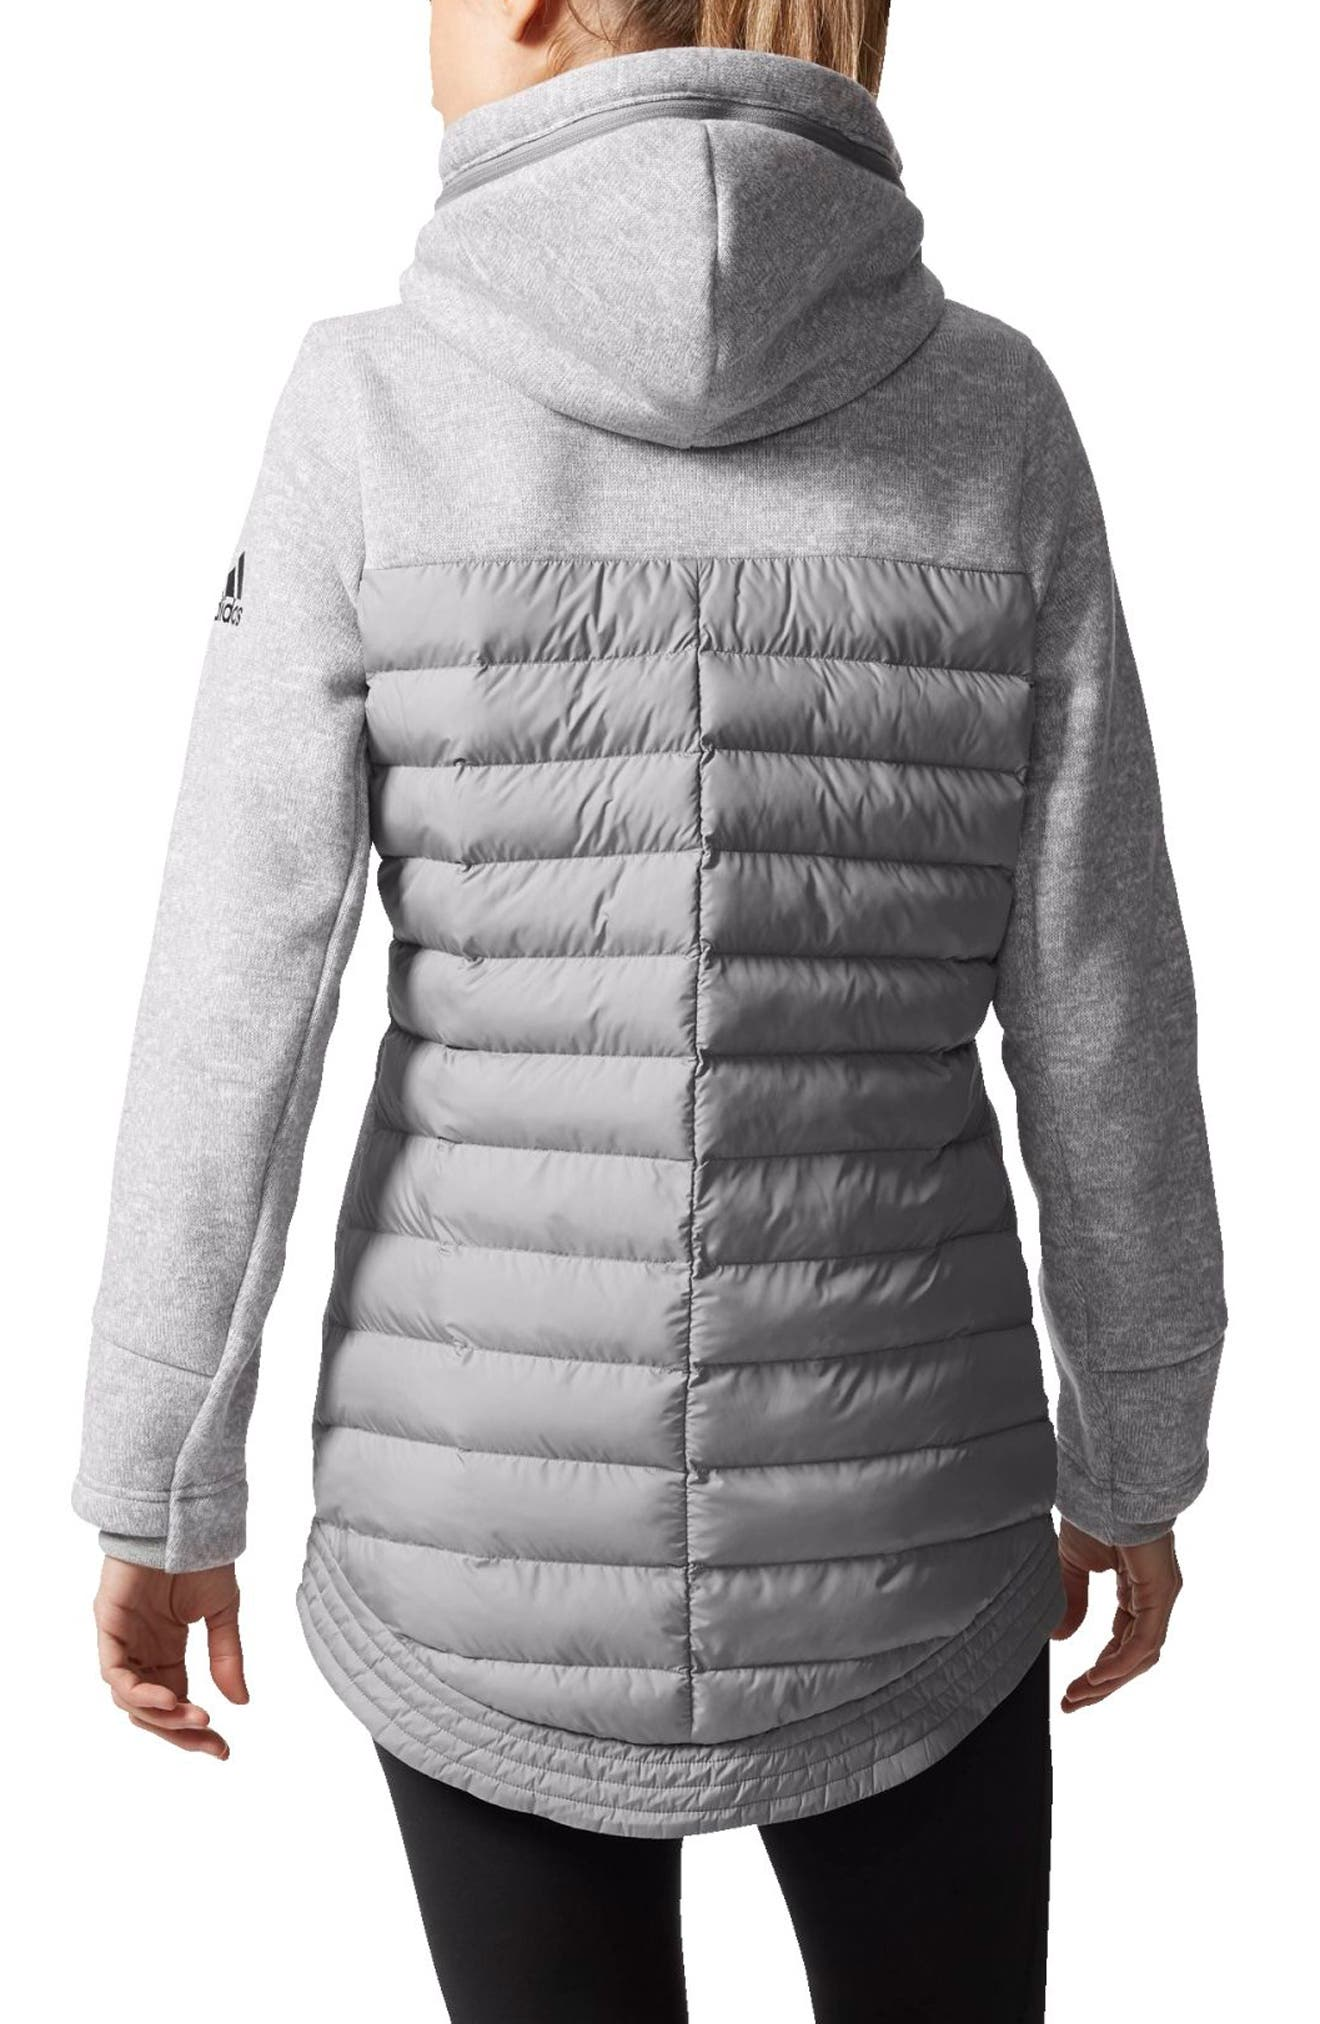 Nuvic Hybrid 2 Fleece/Puffer Jacket,                             Alternate thumbnail 2, color,                             Medium Grey Heather/Solid Grey